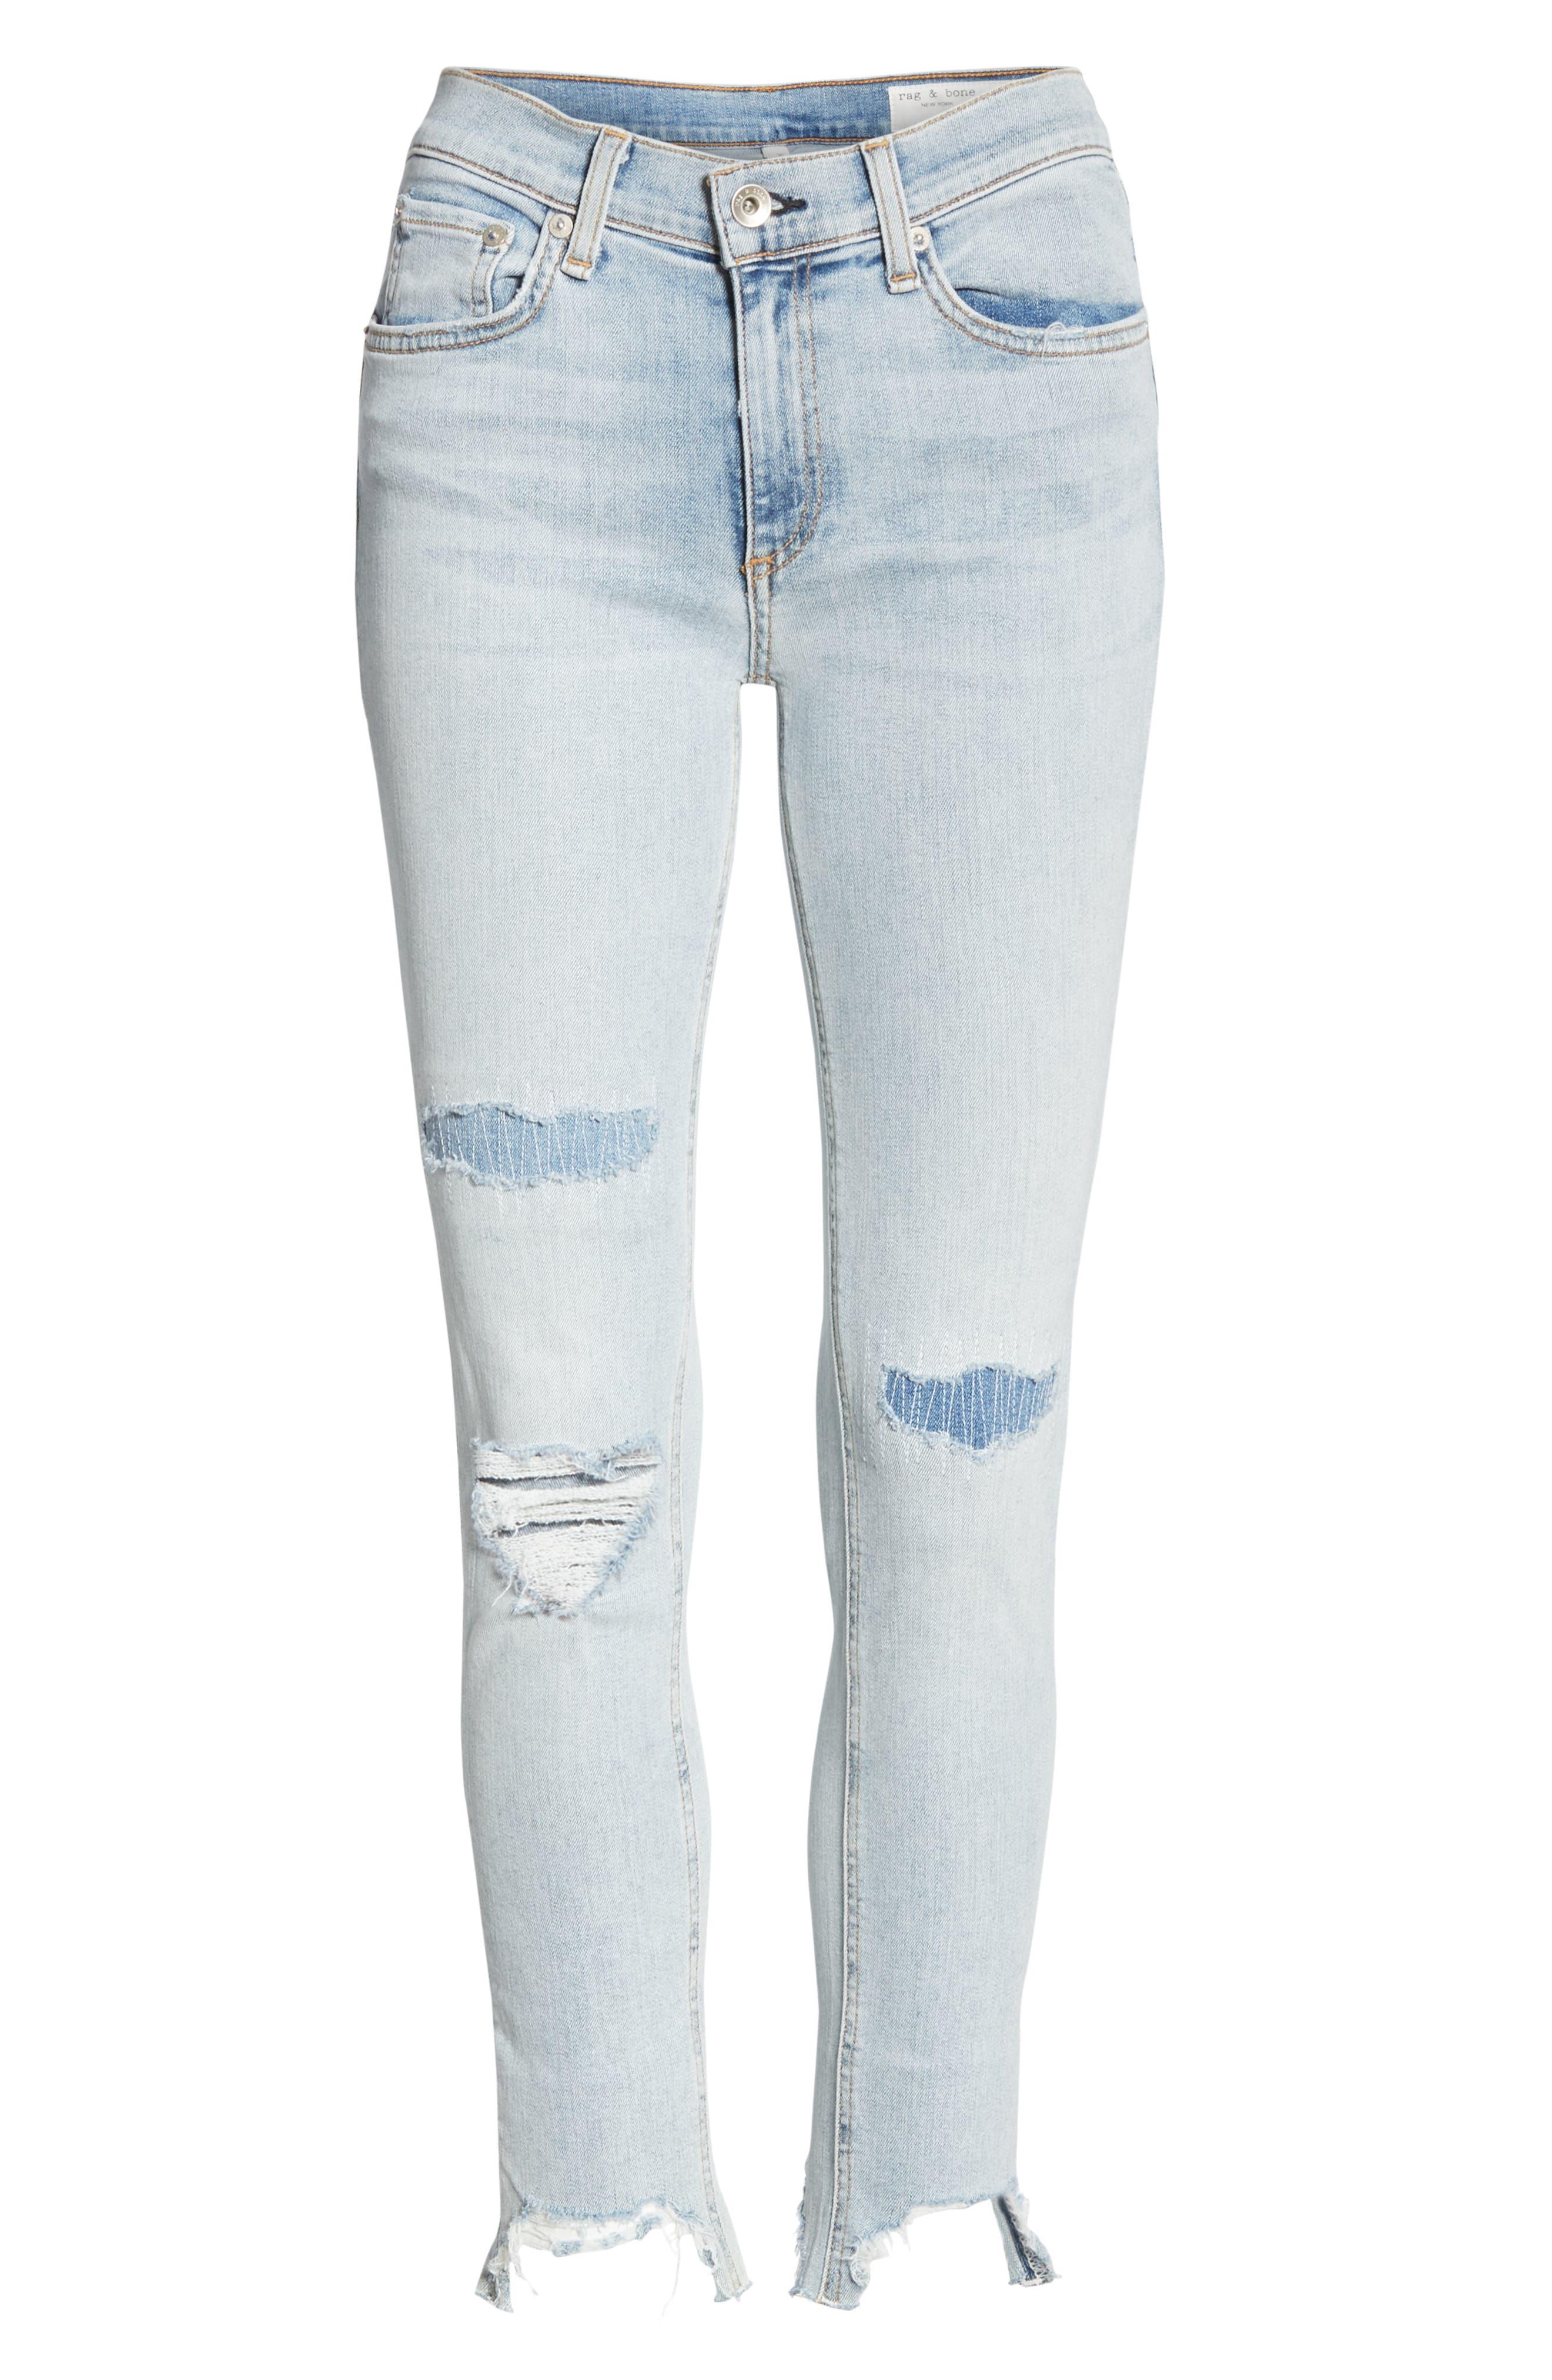 RAG & BONE, JEAN Ripped Ankle Skinny Jeans, Alternate thumbnail 7, color, 450